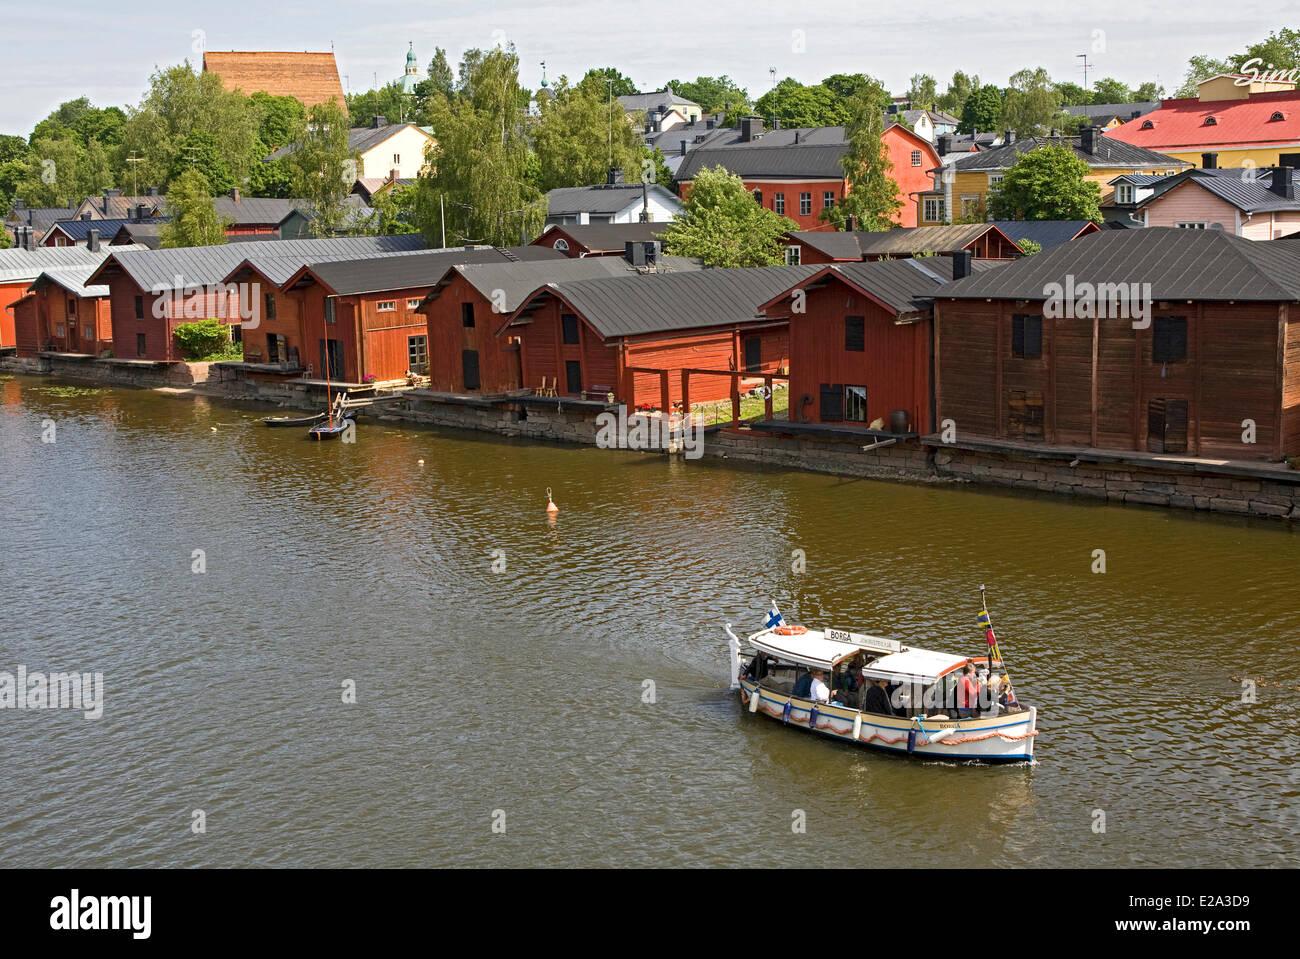 Finland, Uusimaa, Porvoo (Borga), wooden houses on the Porvoo river banks - Stock Image